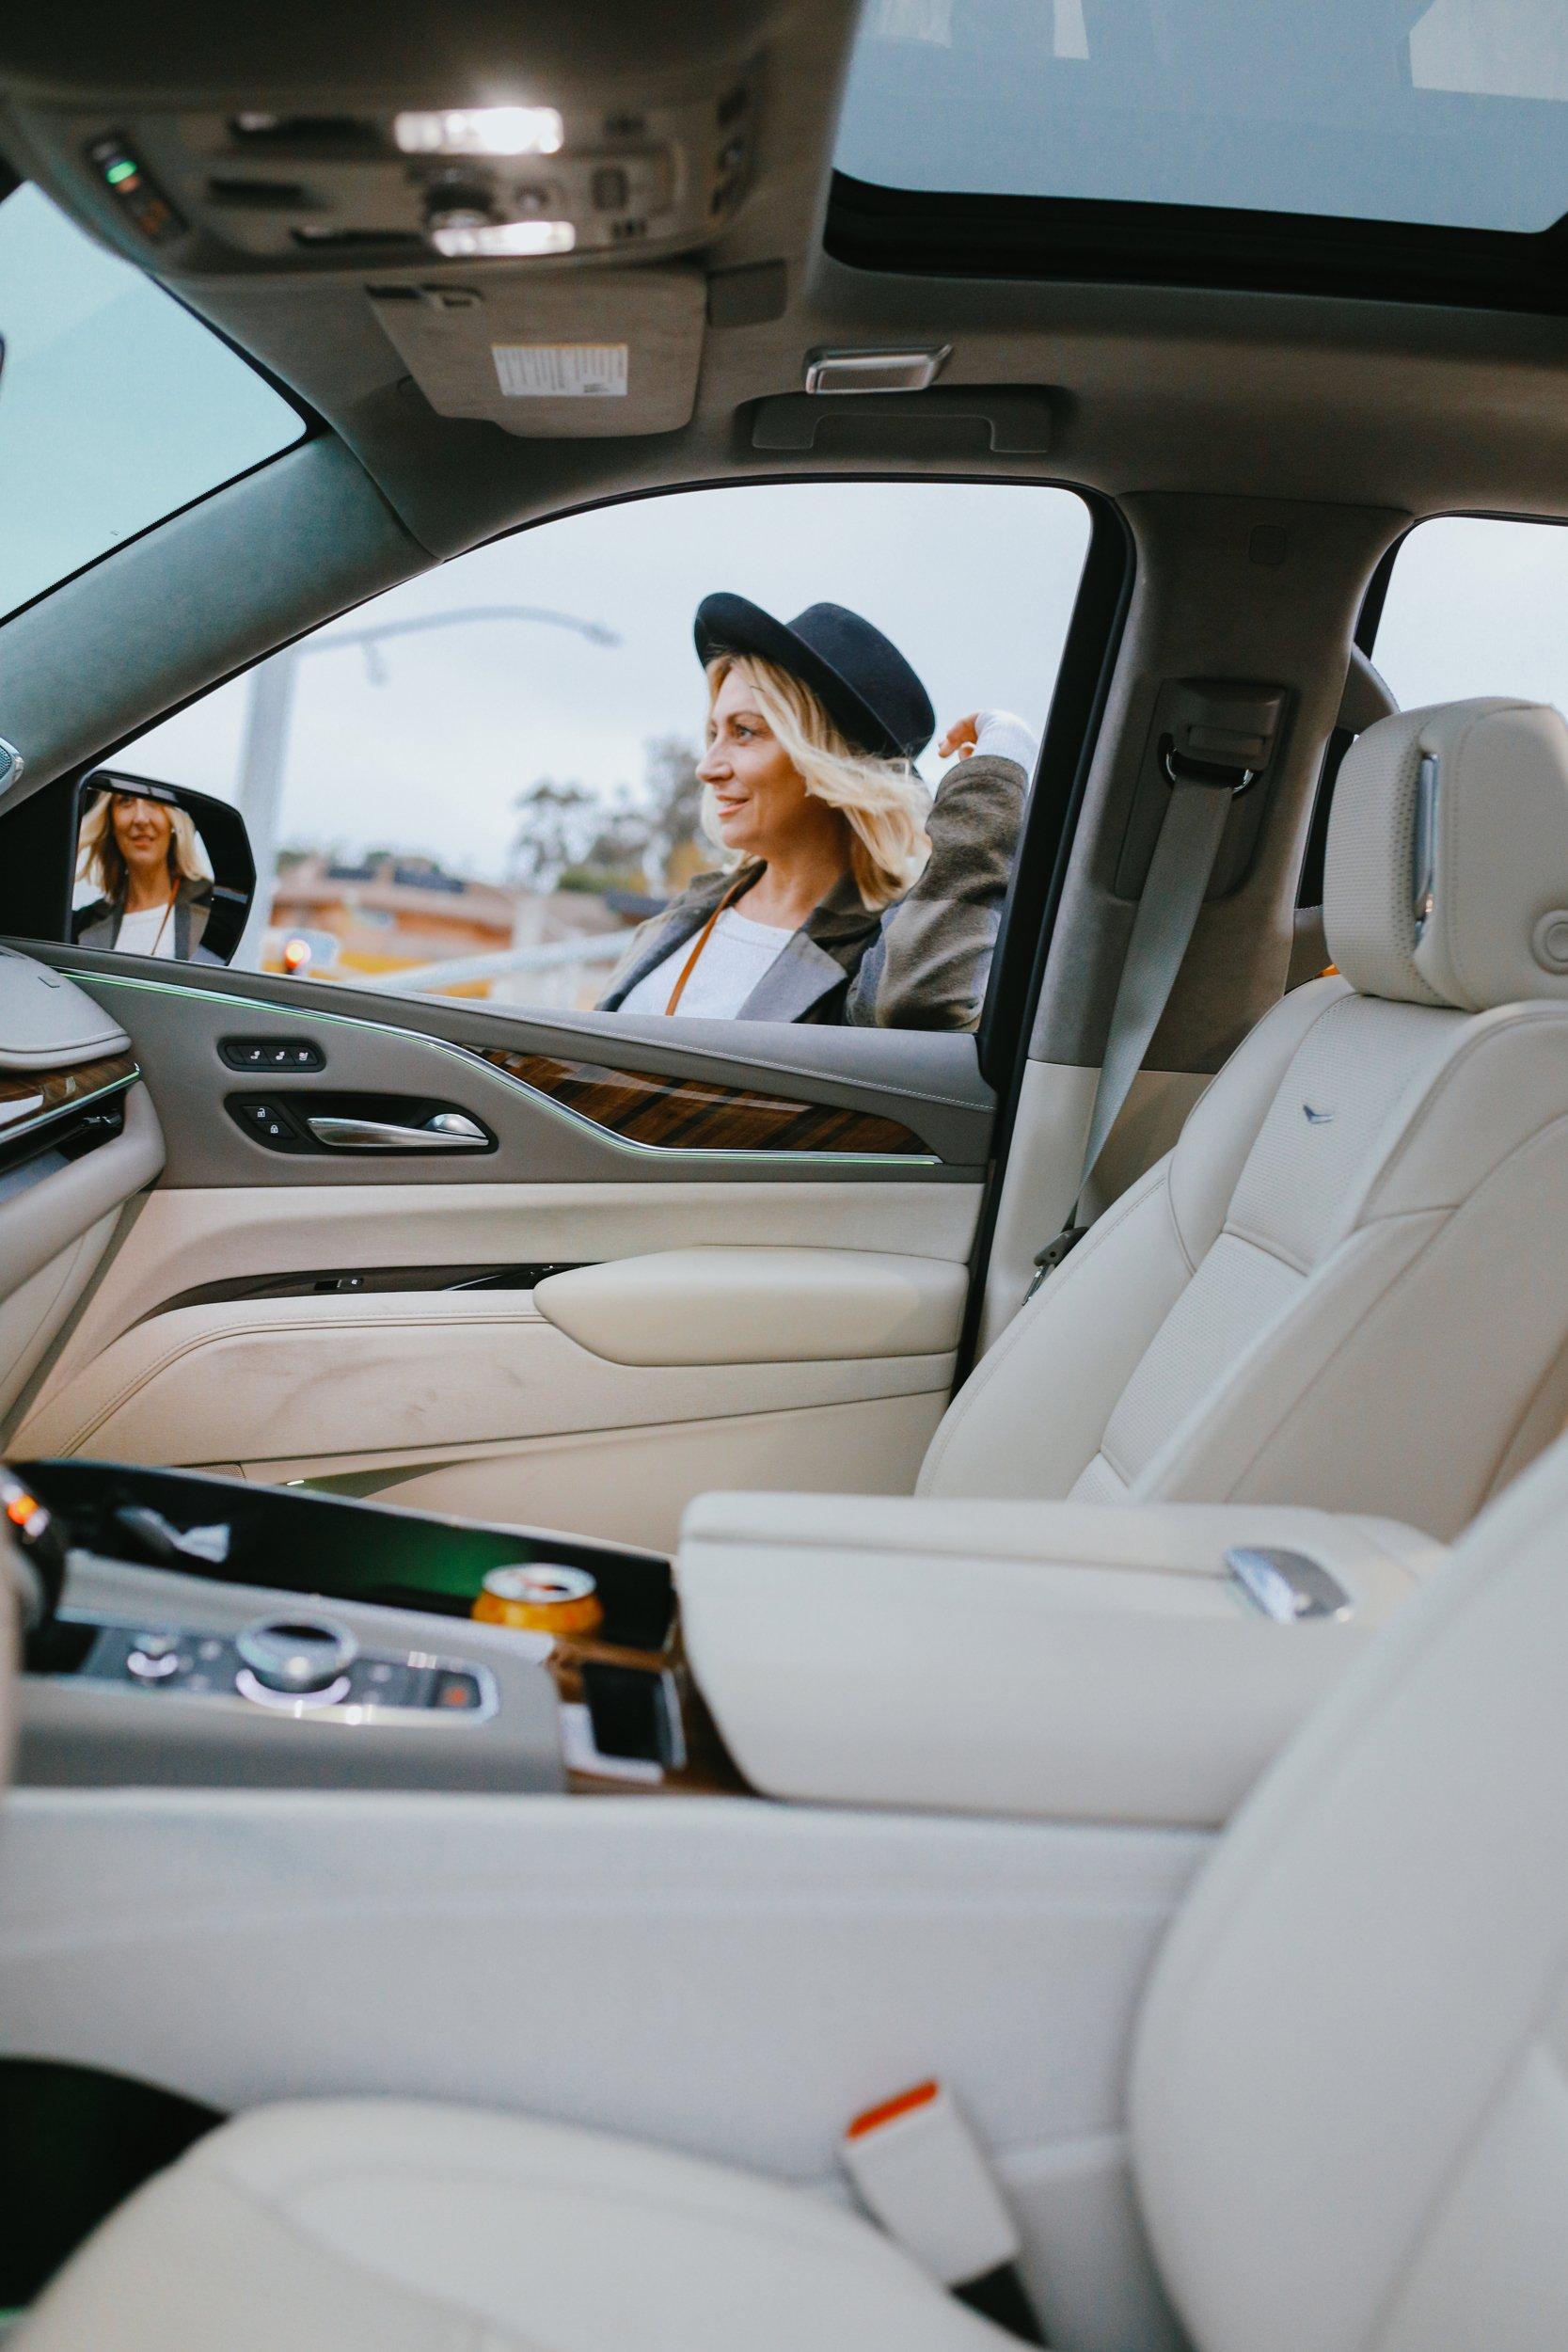 woman through car window